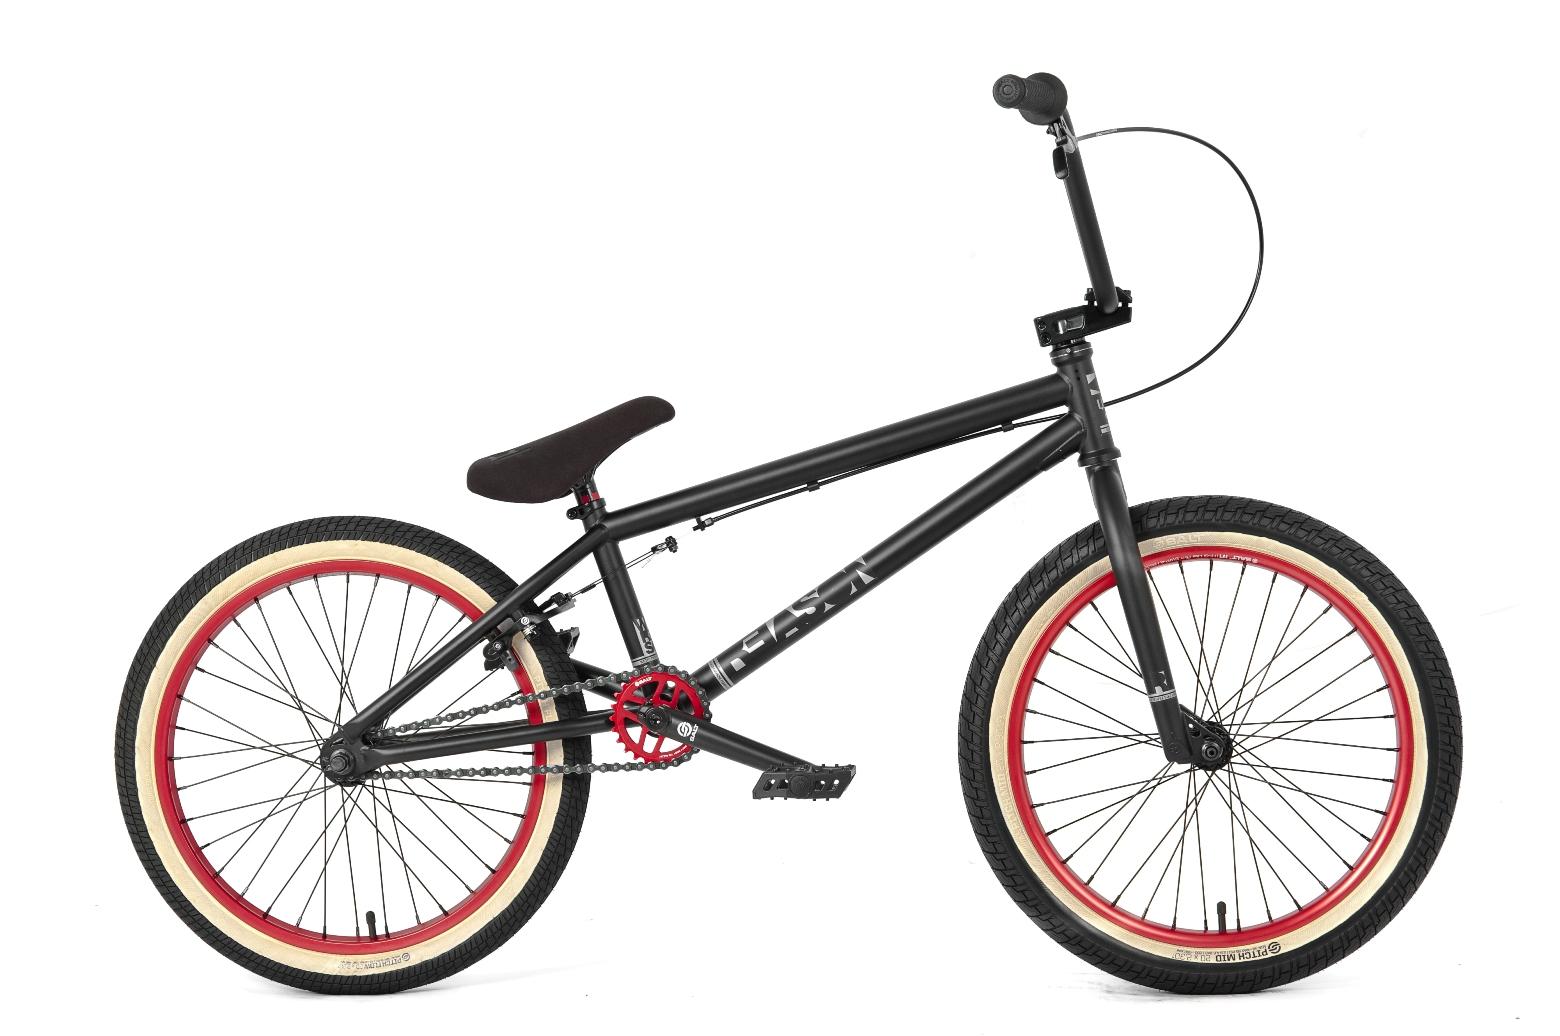 a05d3ae420528 Rower WTP Reason 2012 Black / Red : Sklep AveBmx - rowery, części i ...